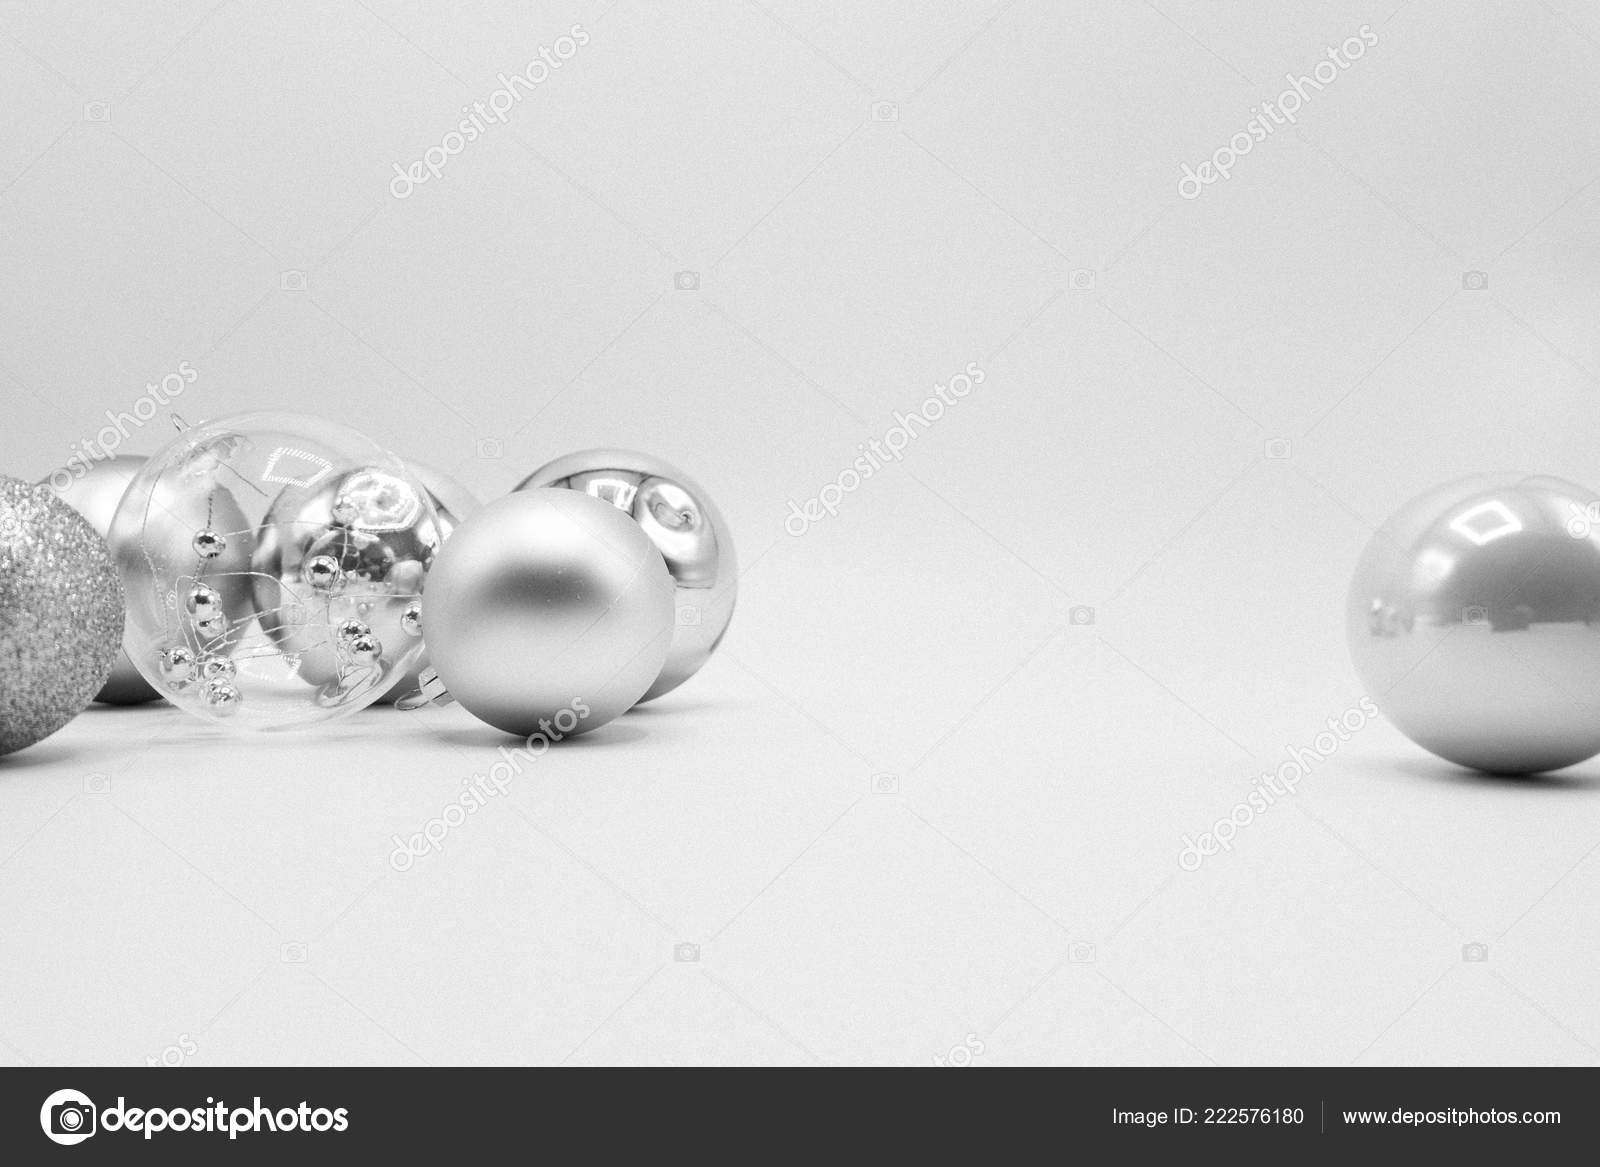 depositphotos 222576180 stock photo monochrome elegant christmas wallpaper background